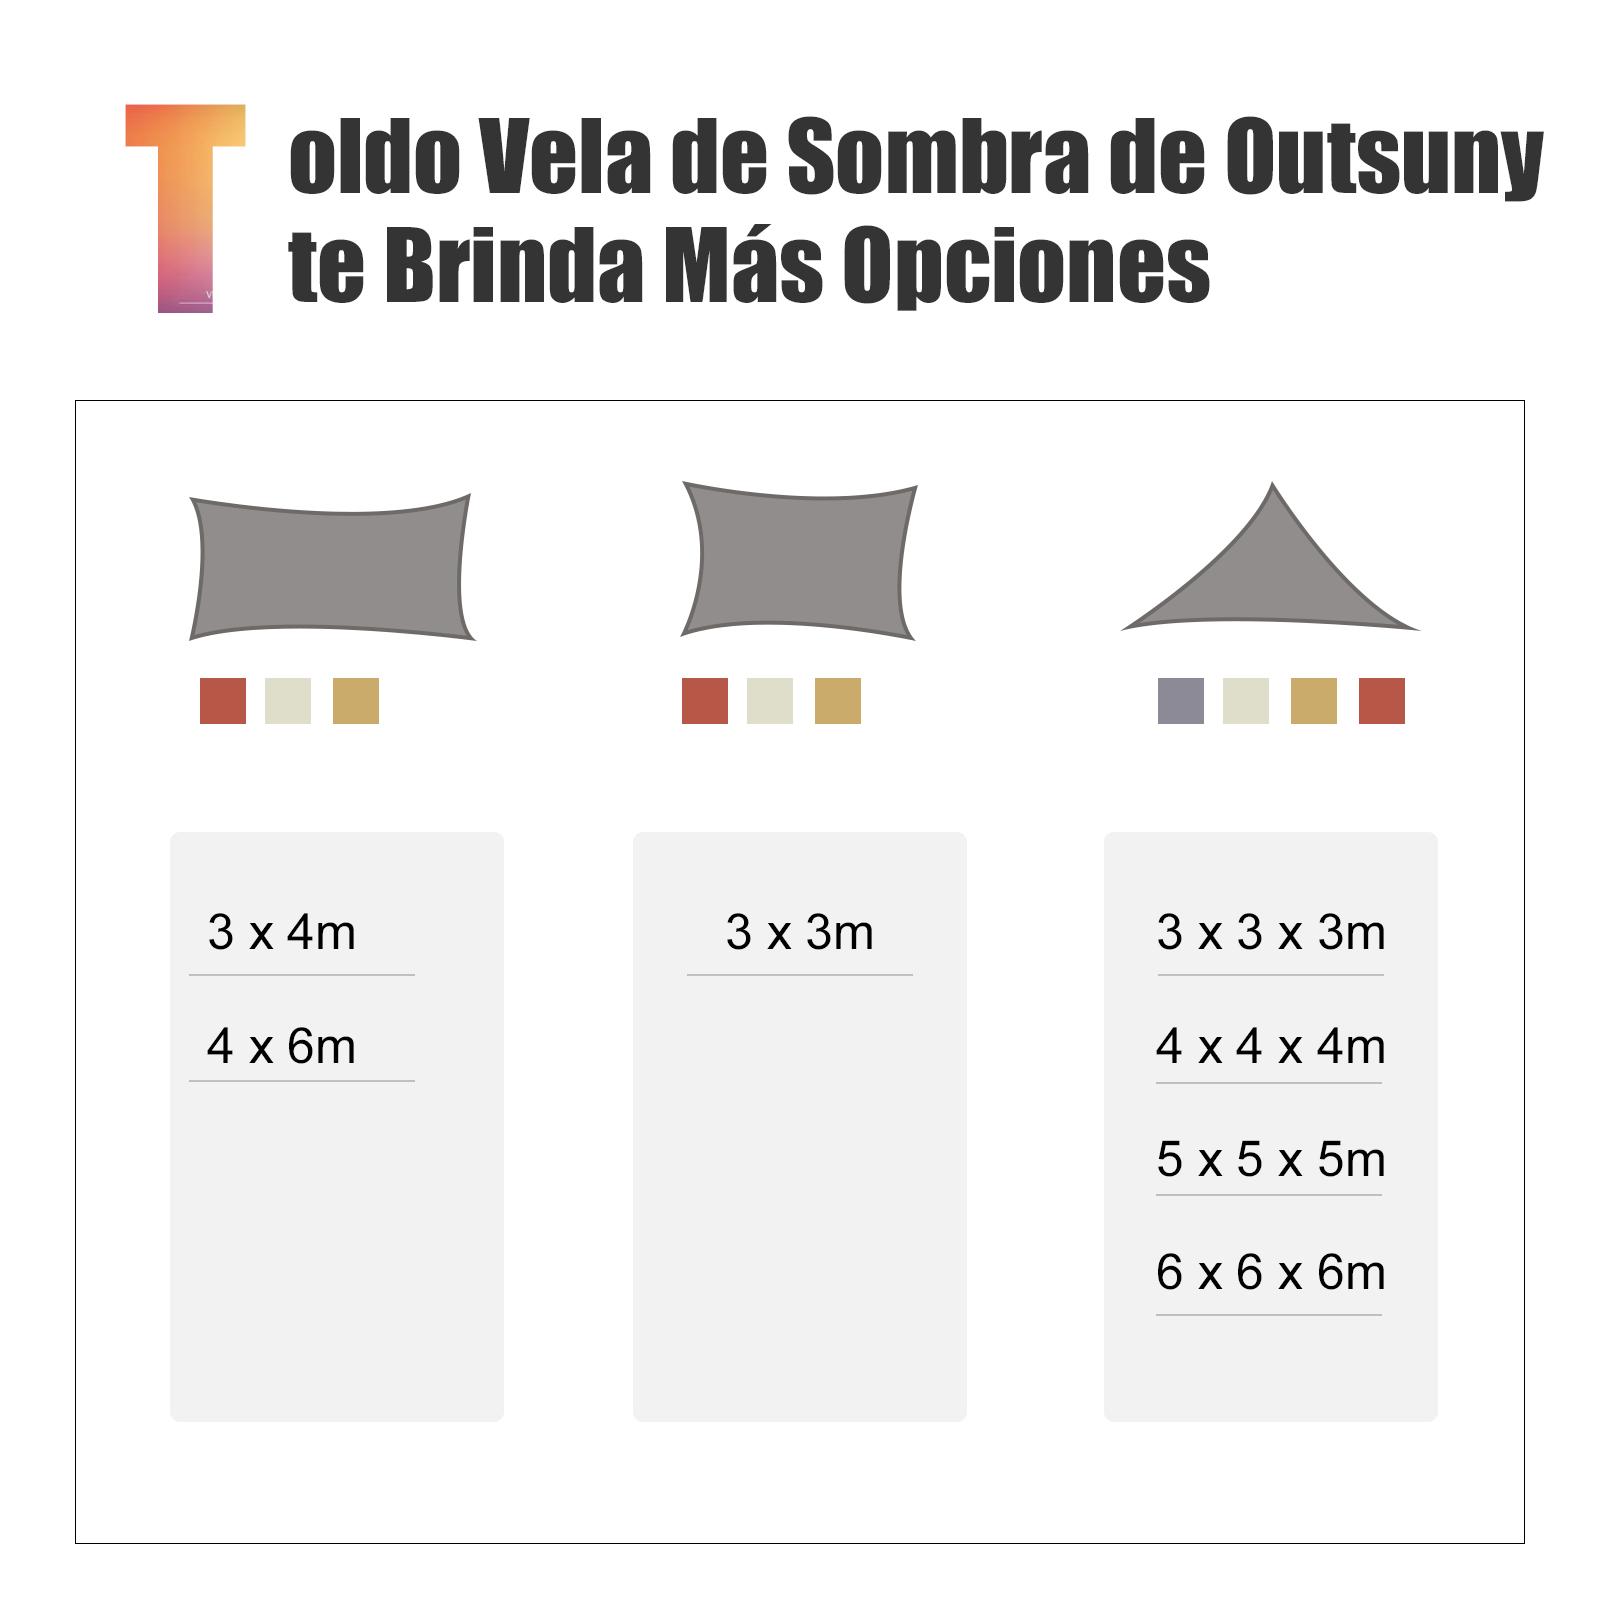 Toldo-Vela-Sombrilla-Parasol-Triangulo-Tejido-de-Poliester-185-g-m-Jardin-Playa miniatura 8